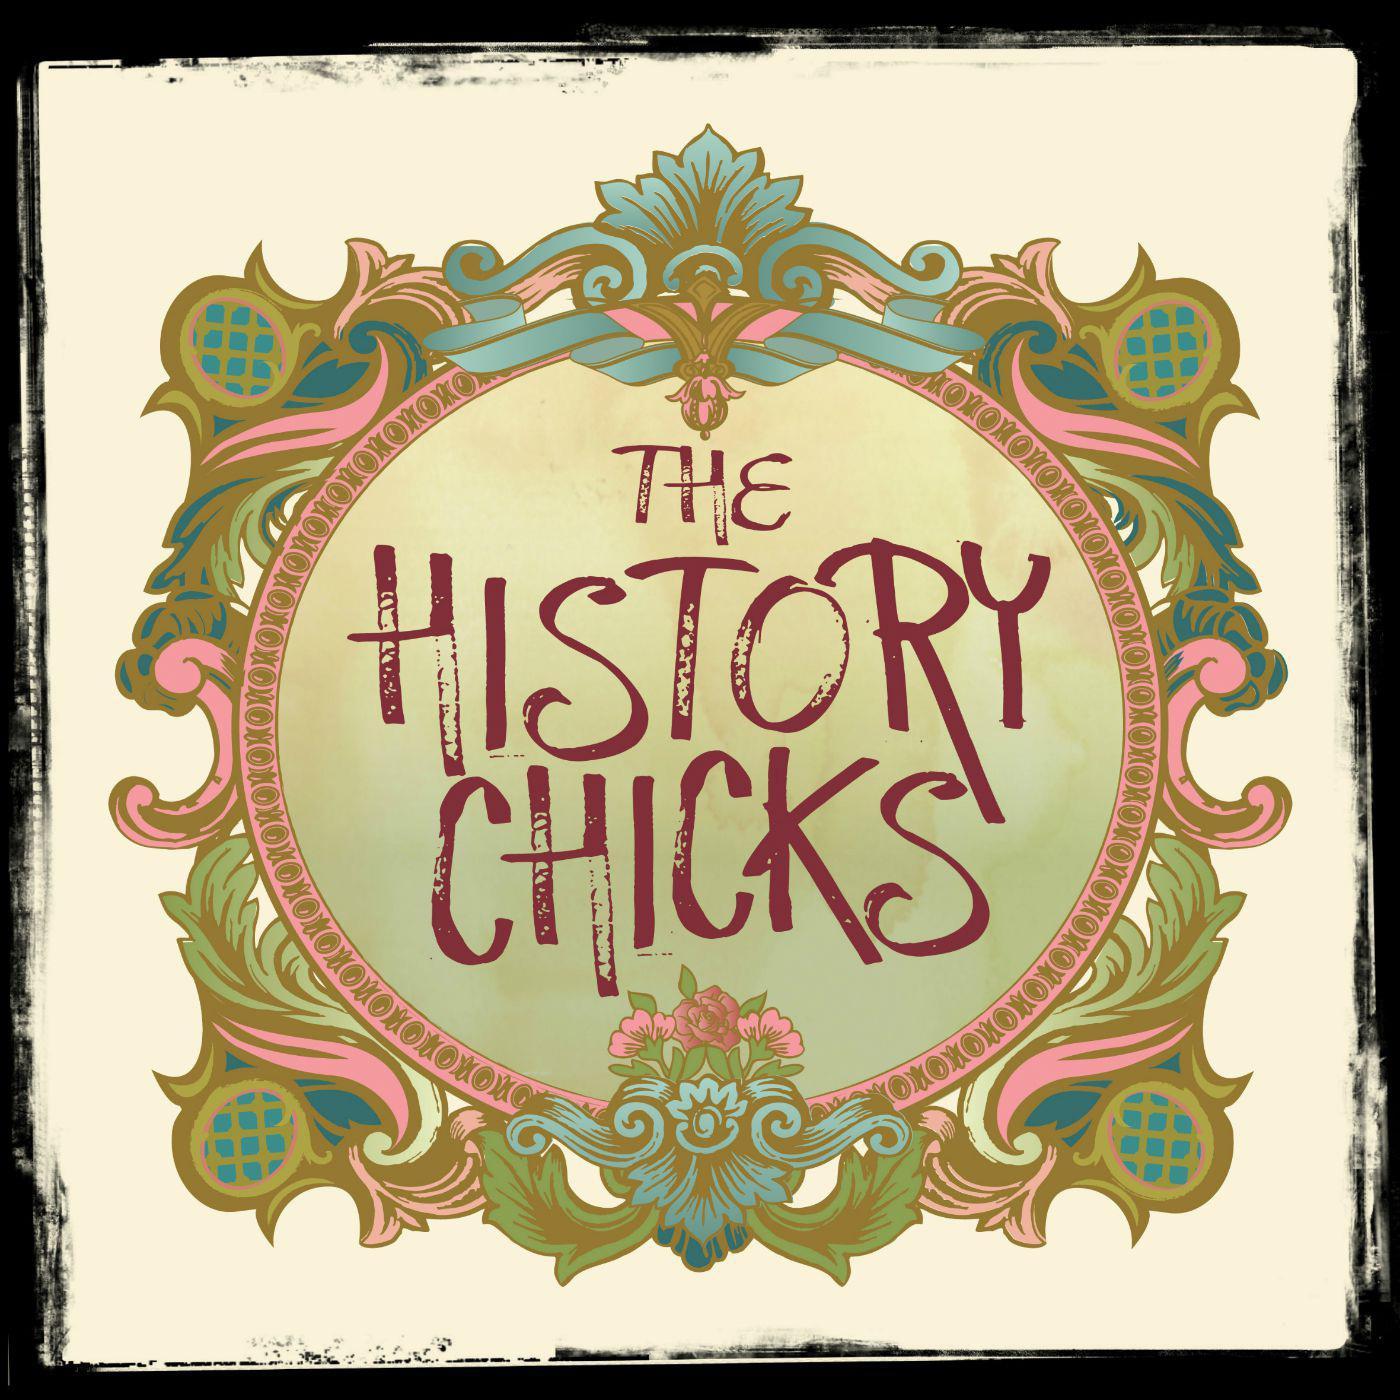 Episode 103: Ada Lovelace - The History Chicks (podcast)   Listen Notes